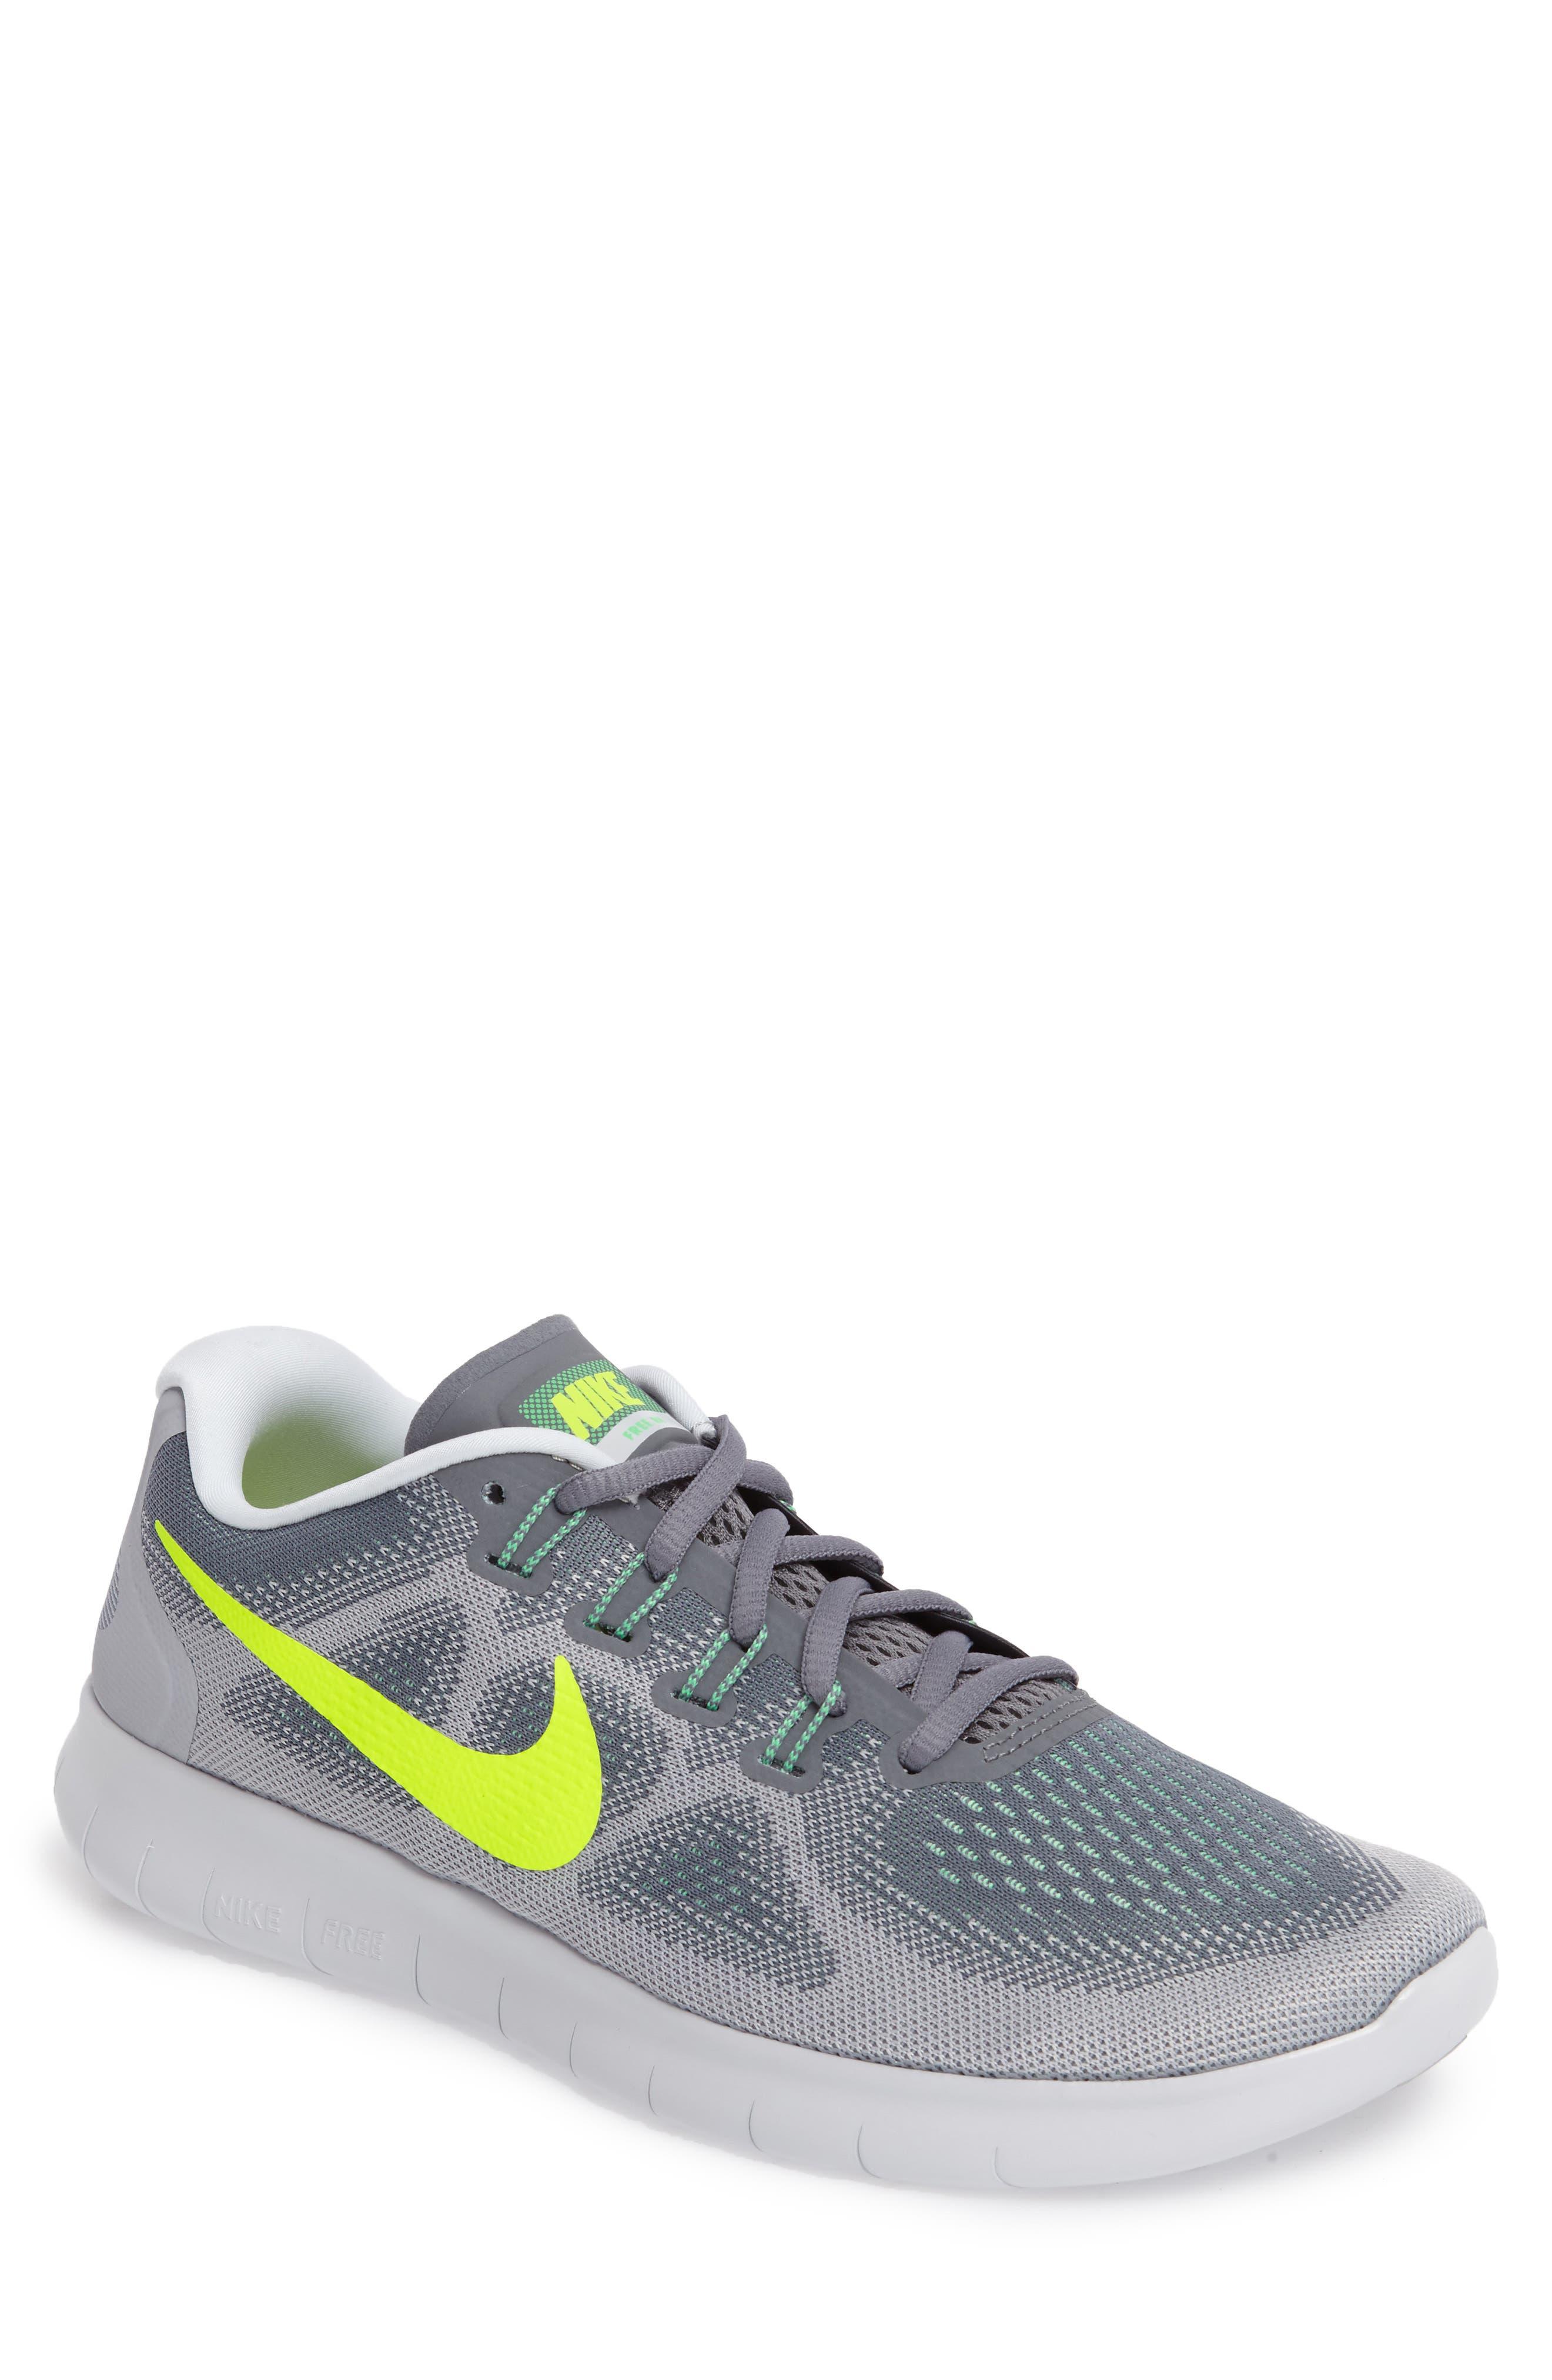 Nike Free Run 3 0 Carte Nordstrom